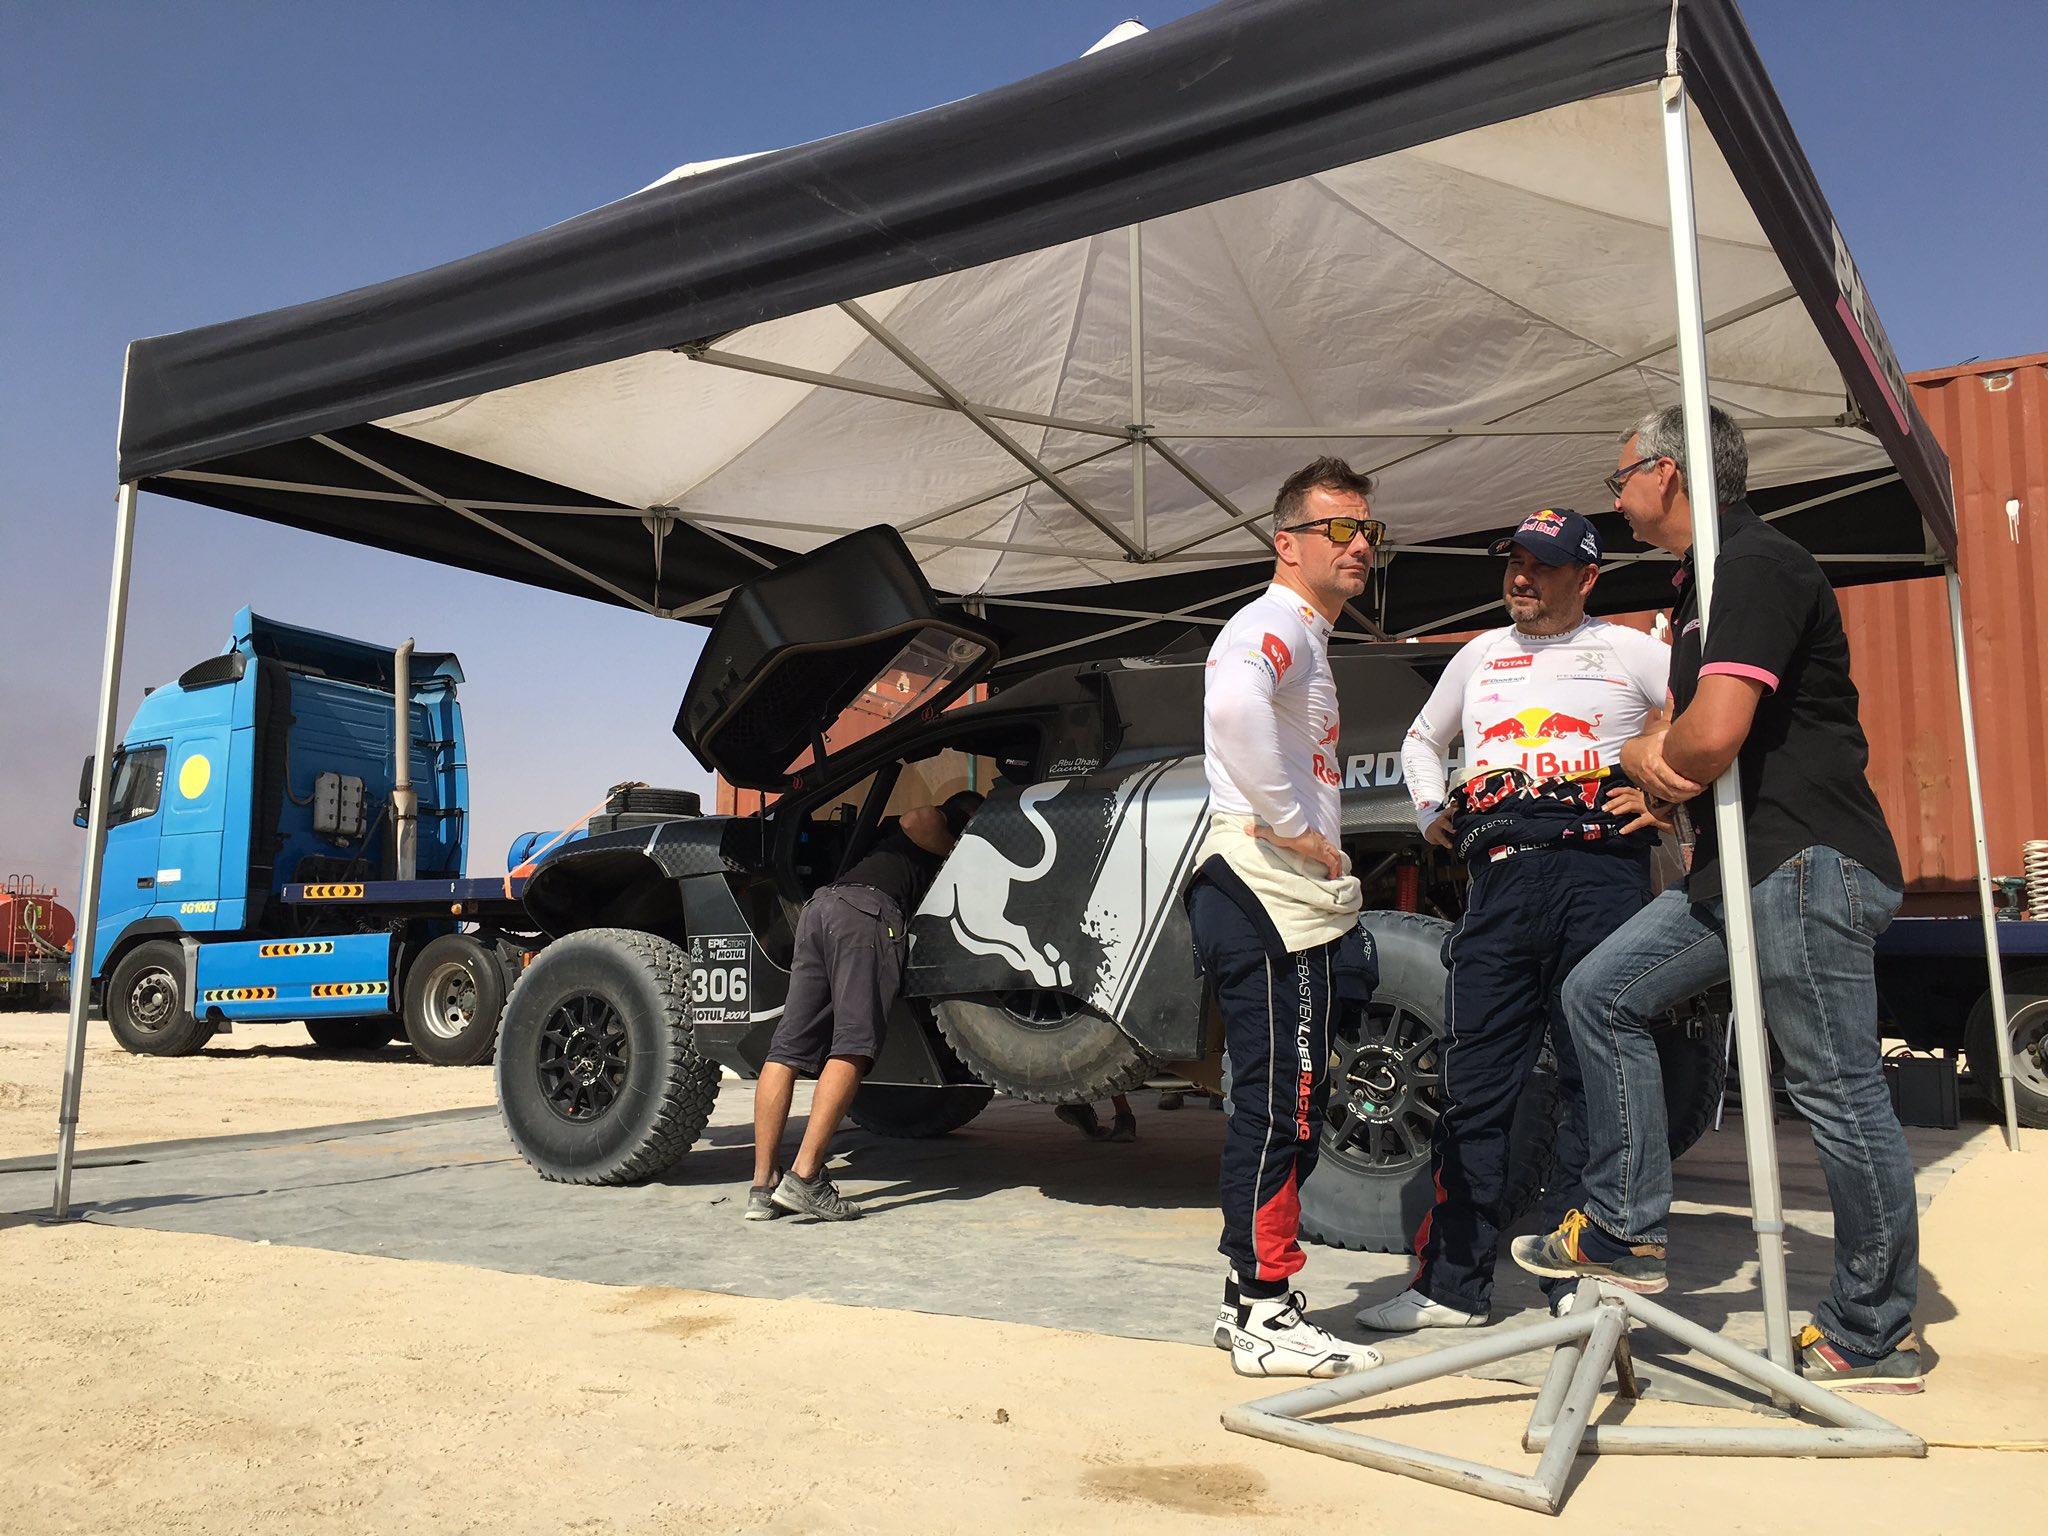 2019 41º Rallye Raid Dakar - Perú [6-17 Enero] - Página 2 DuJho2FX4AIwu0Z